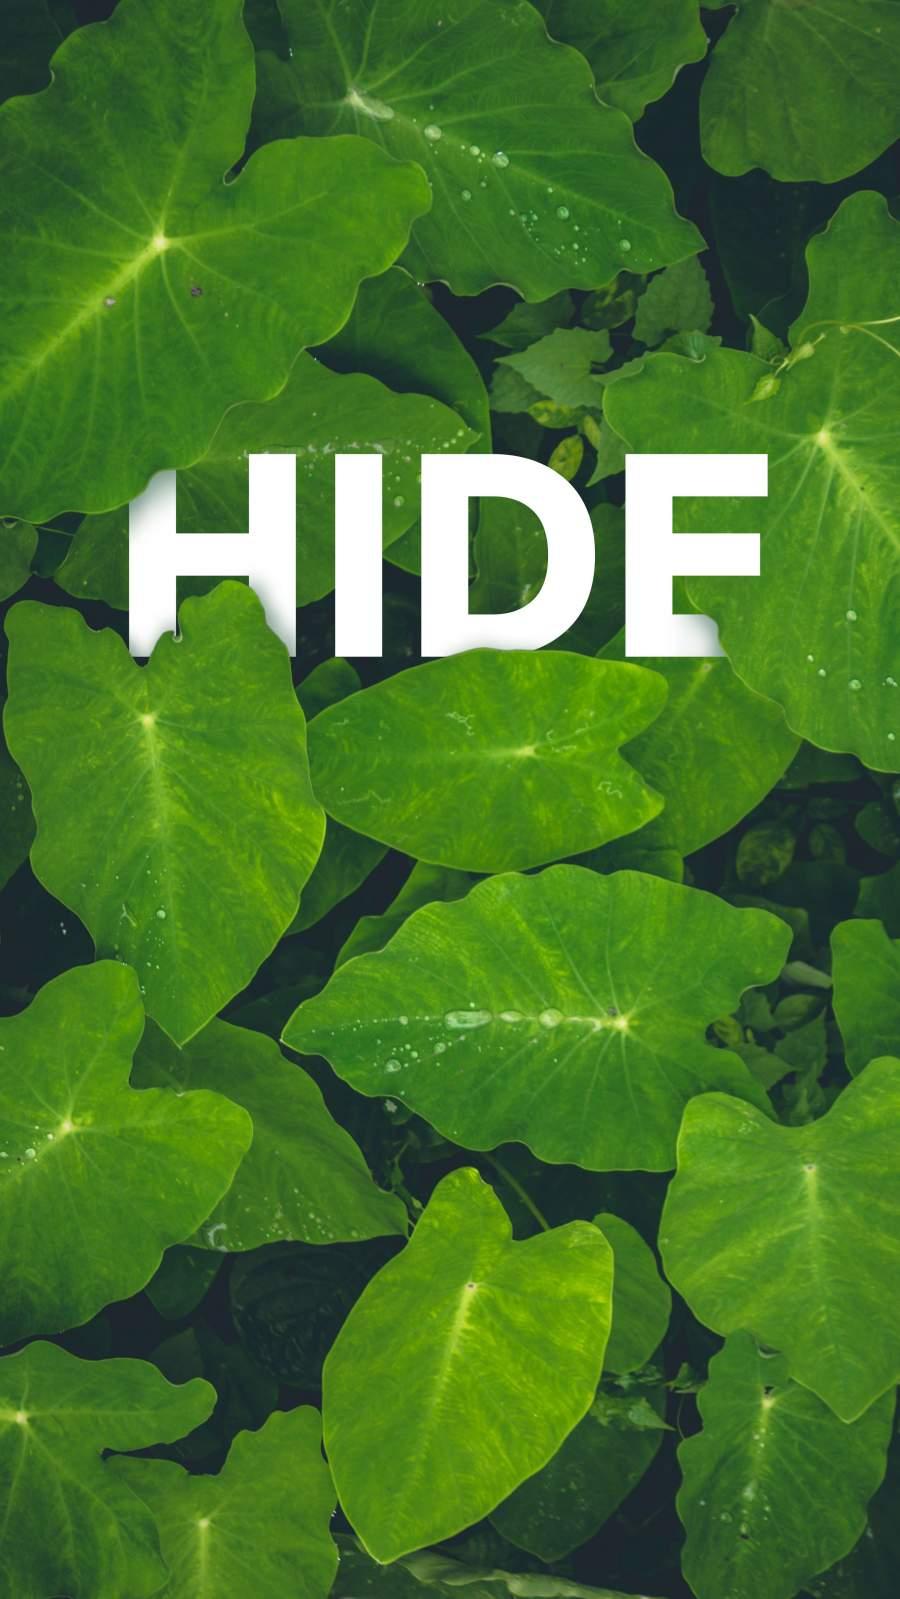 Hide in Nature iPhone Wallpaper